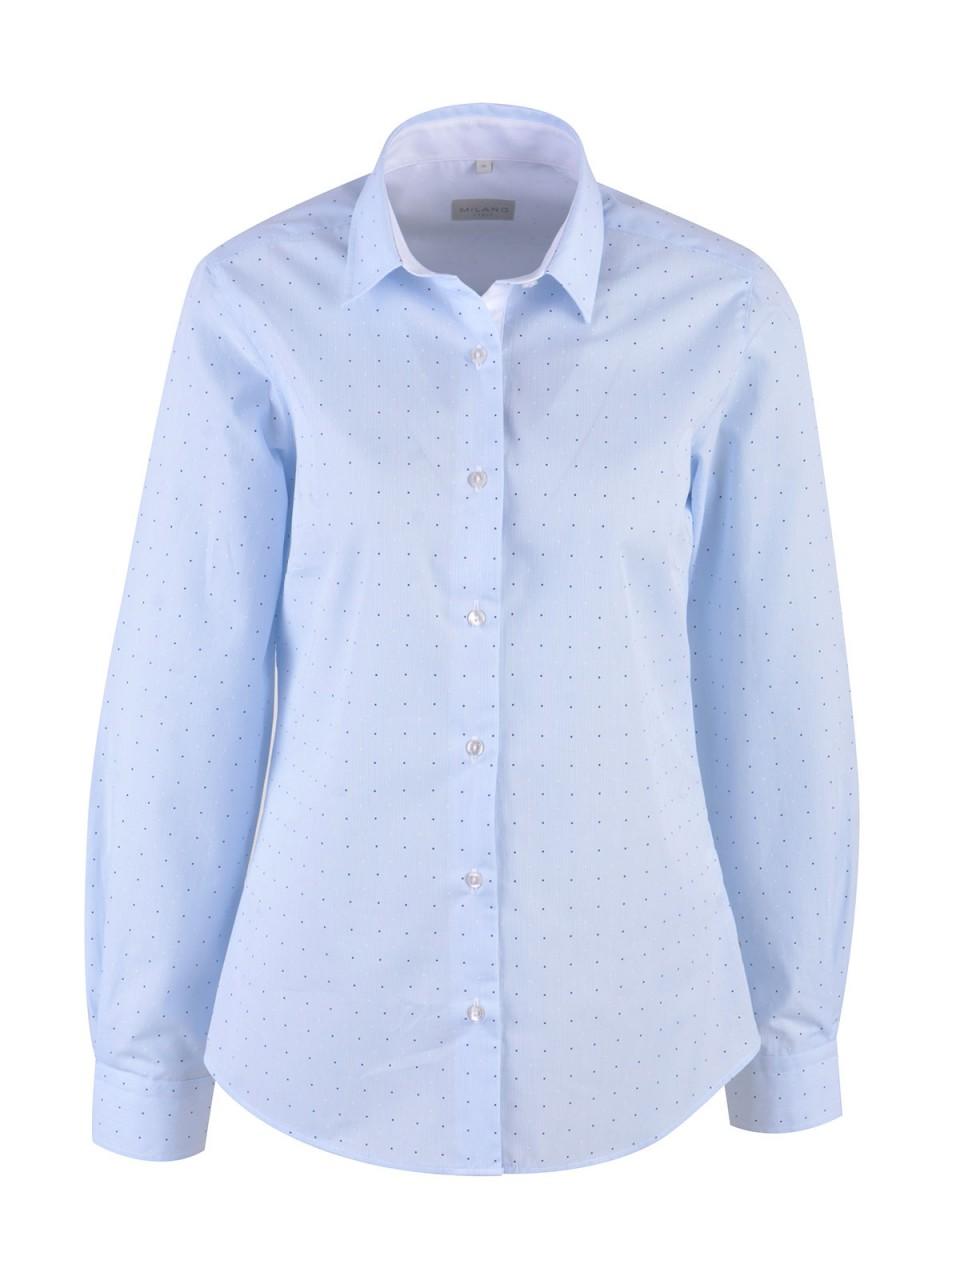 Oberteile - MILANO ITALY Damen Bluse, hellblau  - Onlineshop Designermode.com